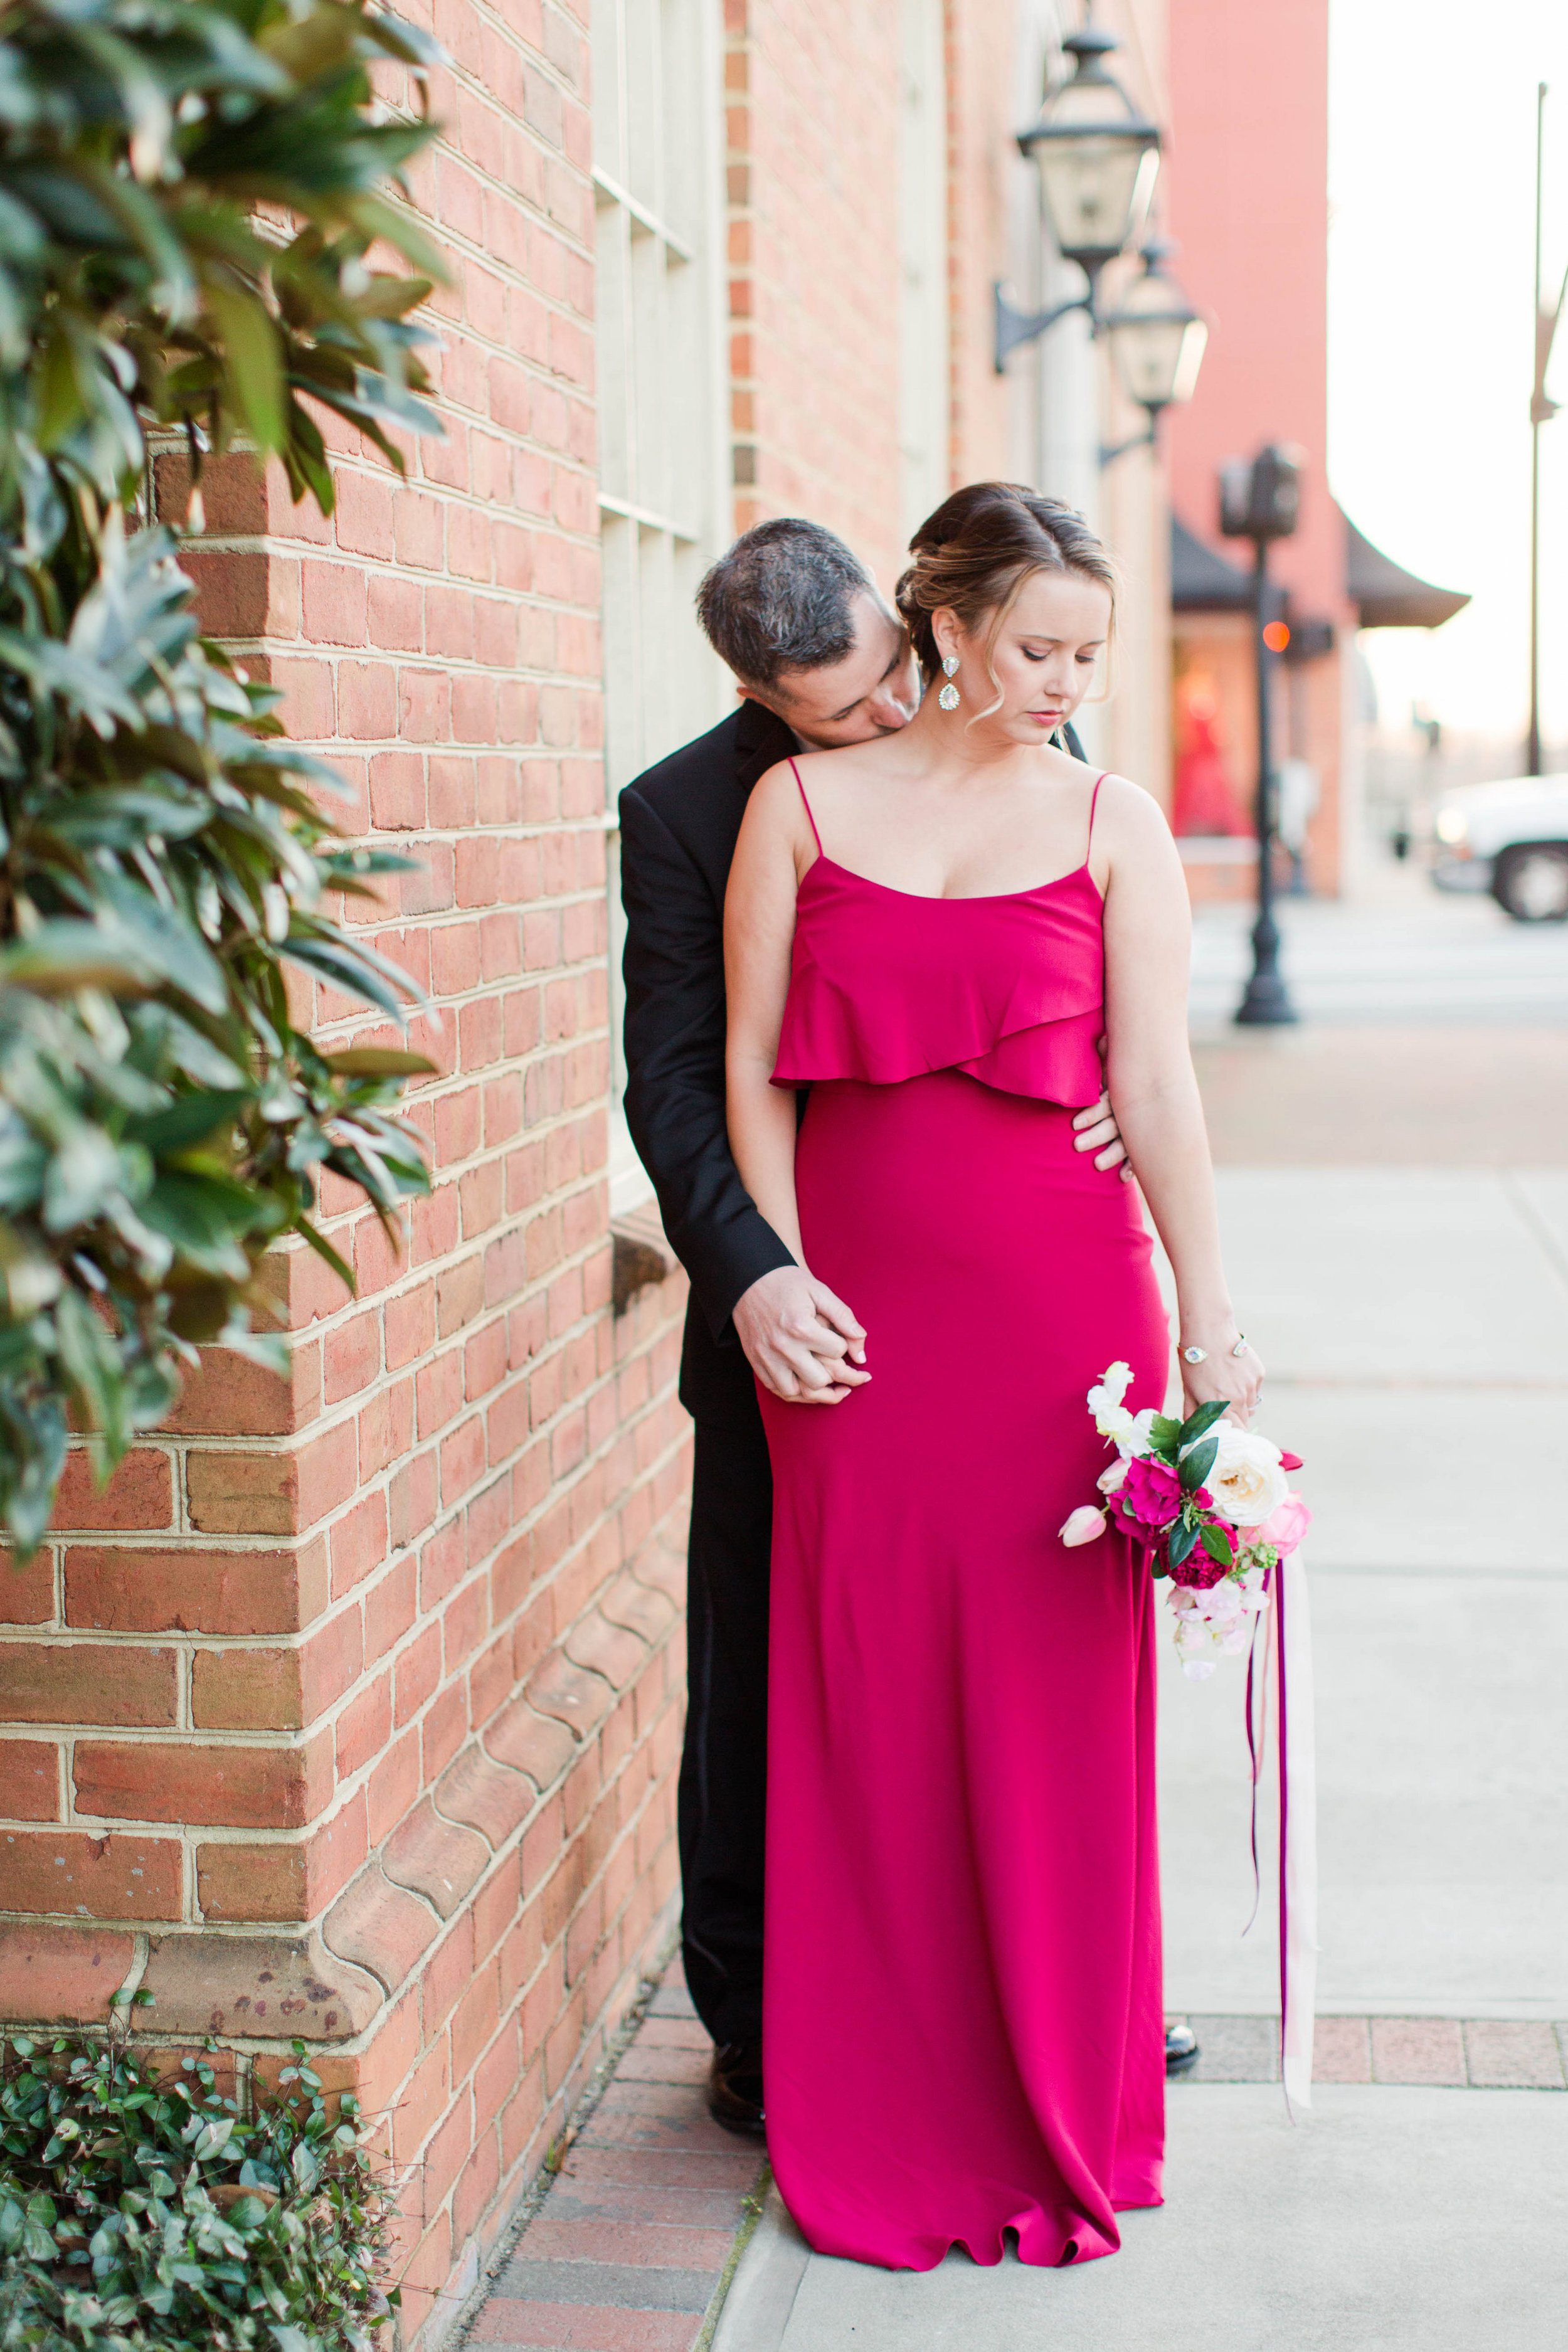 afloral-fake-flower-wedding-ivory-and-beau-bridal-boutique-maggie-sottero-saffron-the-hall-on-vine-wedding-statesboro-wedding-savannah-wedding-kristian-designs-rachel-strickland-photography-savannah-bridal-southern-bride-savannah-bride-17.jpg